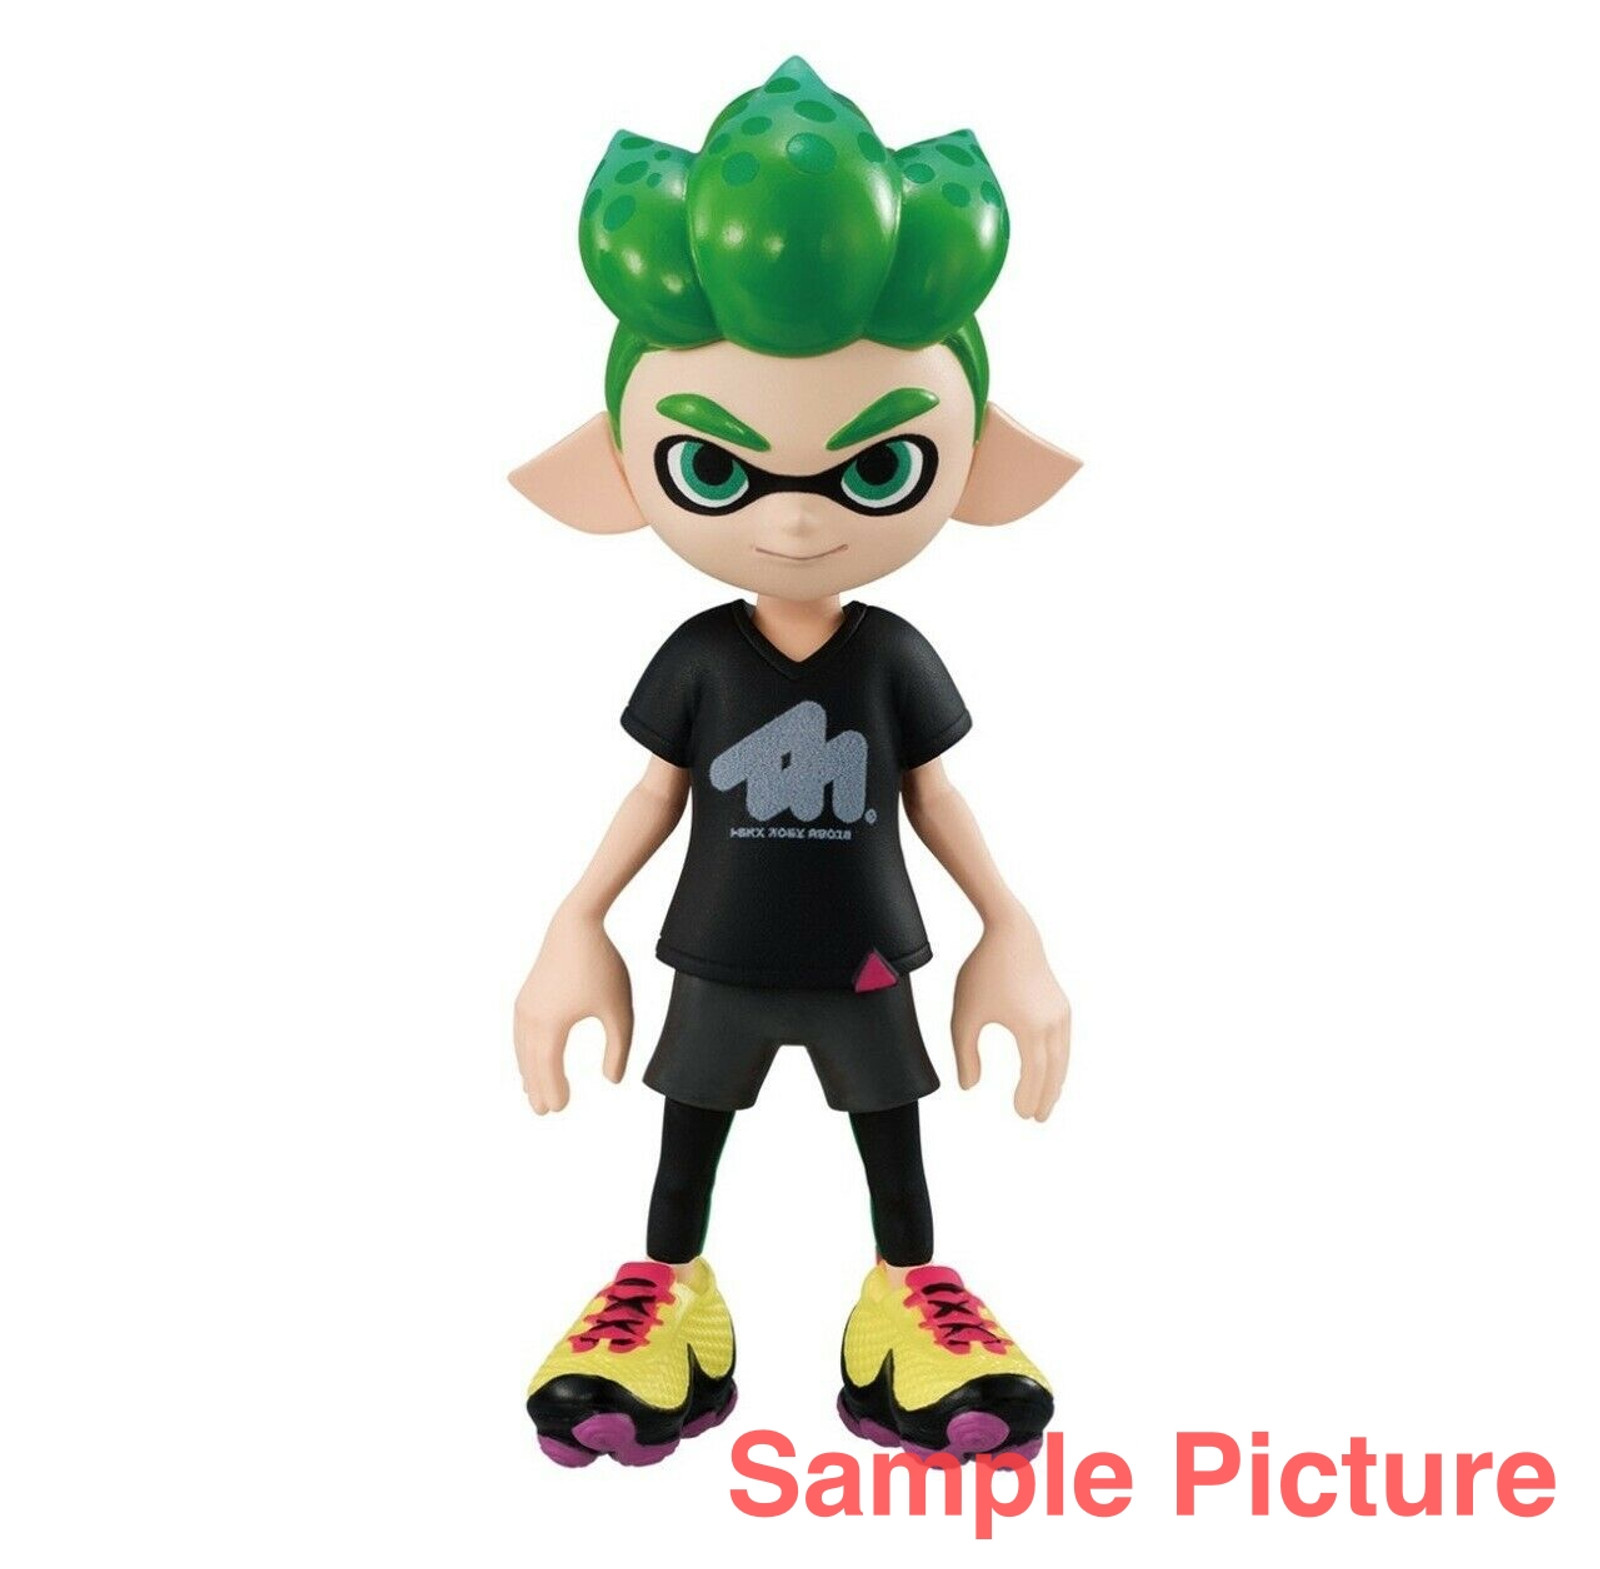 Splatoon 2 Dress-up Figure Gear Collection Squid BOY 1 JAPAN Nintendo Switch